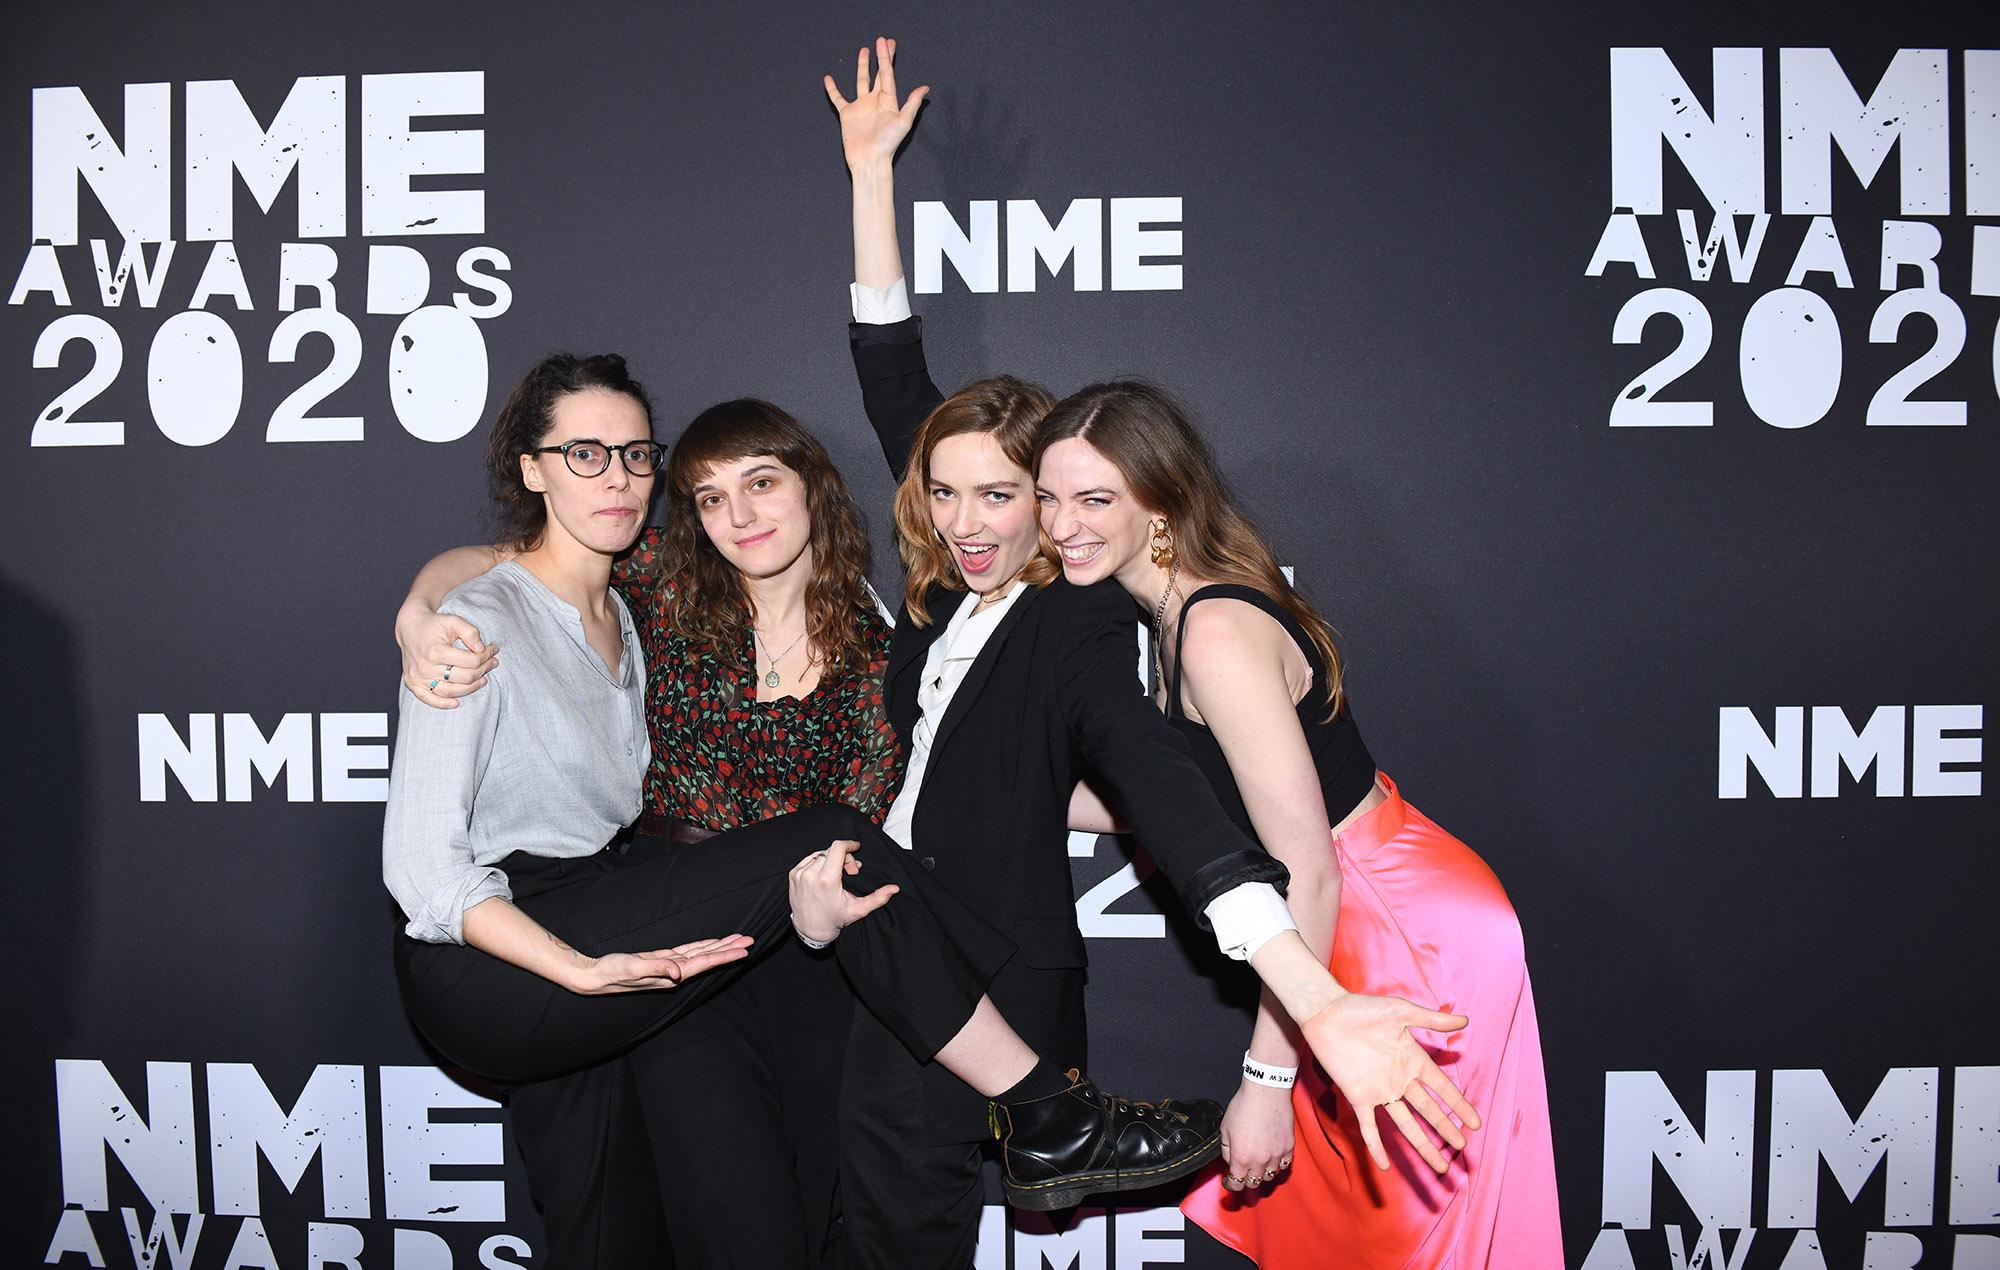 The Big Moon NME Awards 2020